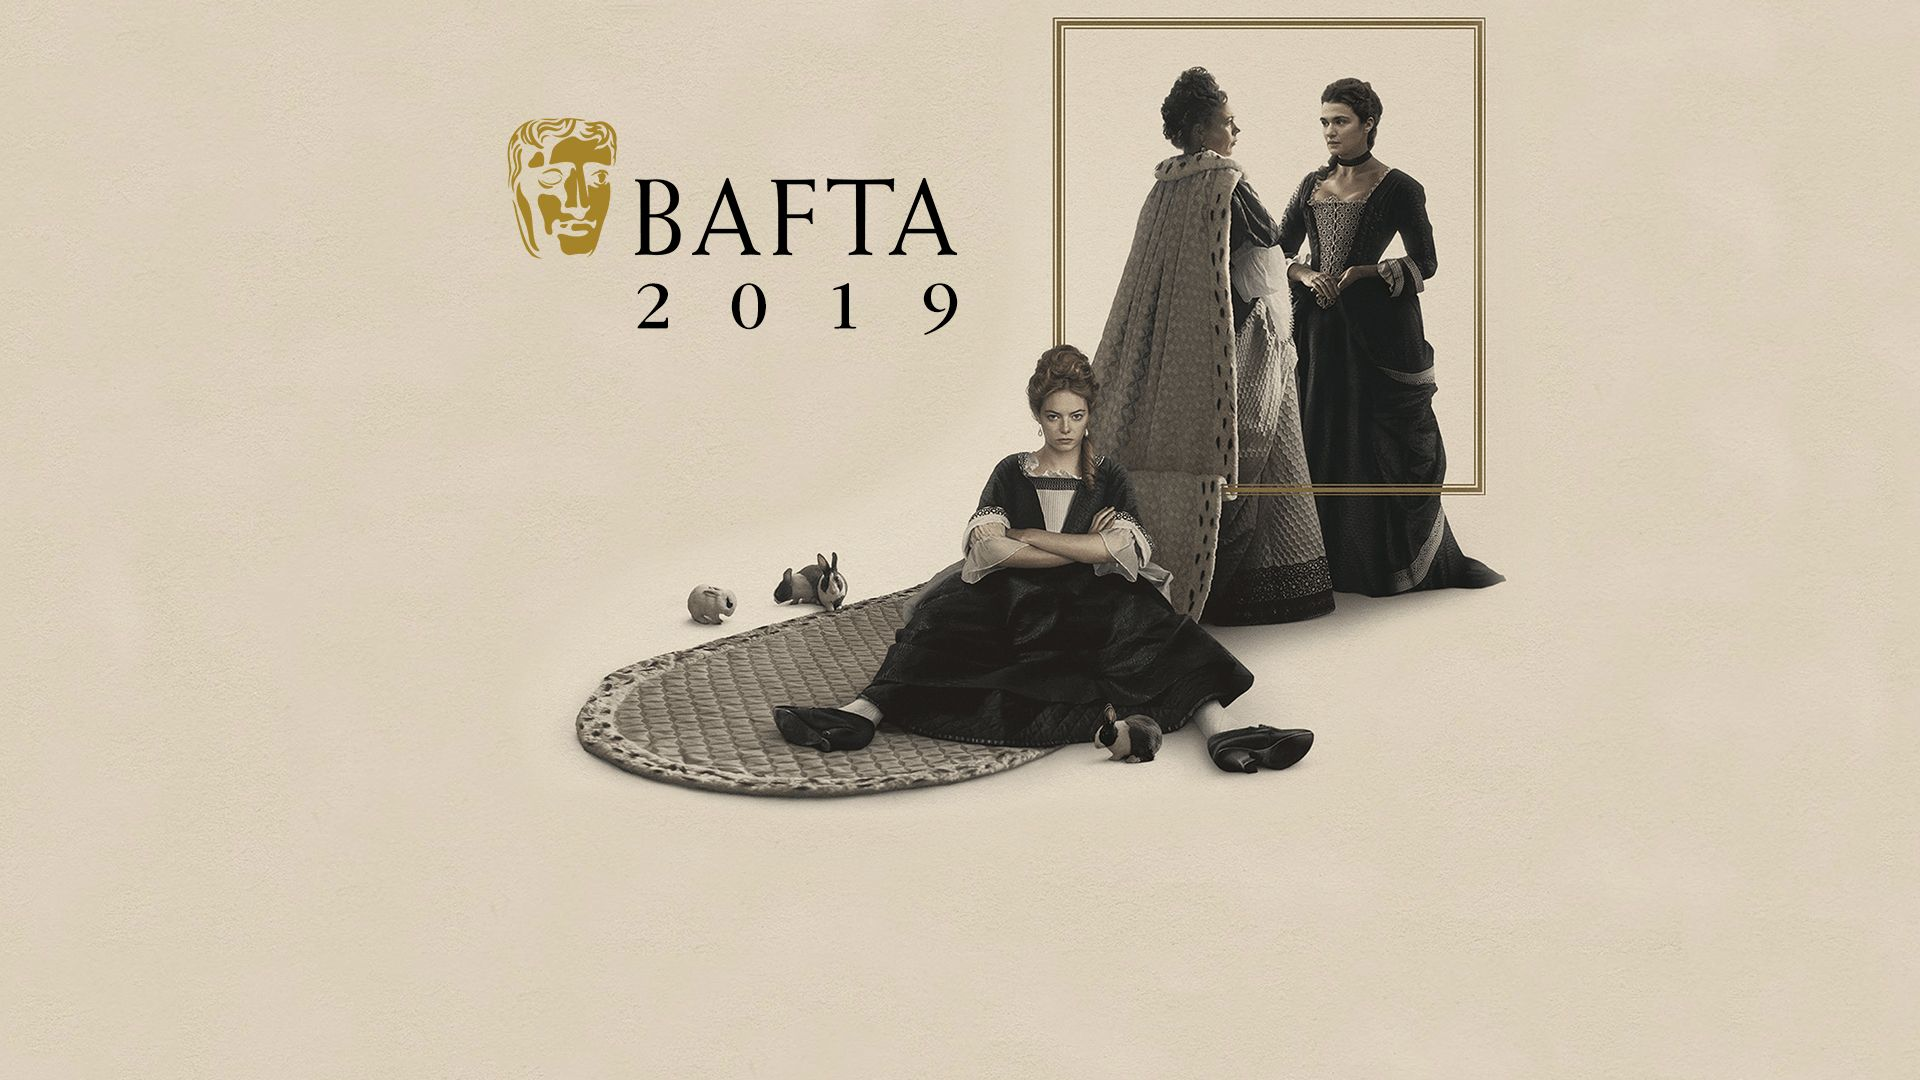 BAFTA 2019 : révélation des nominations